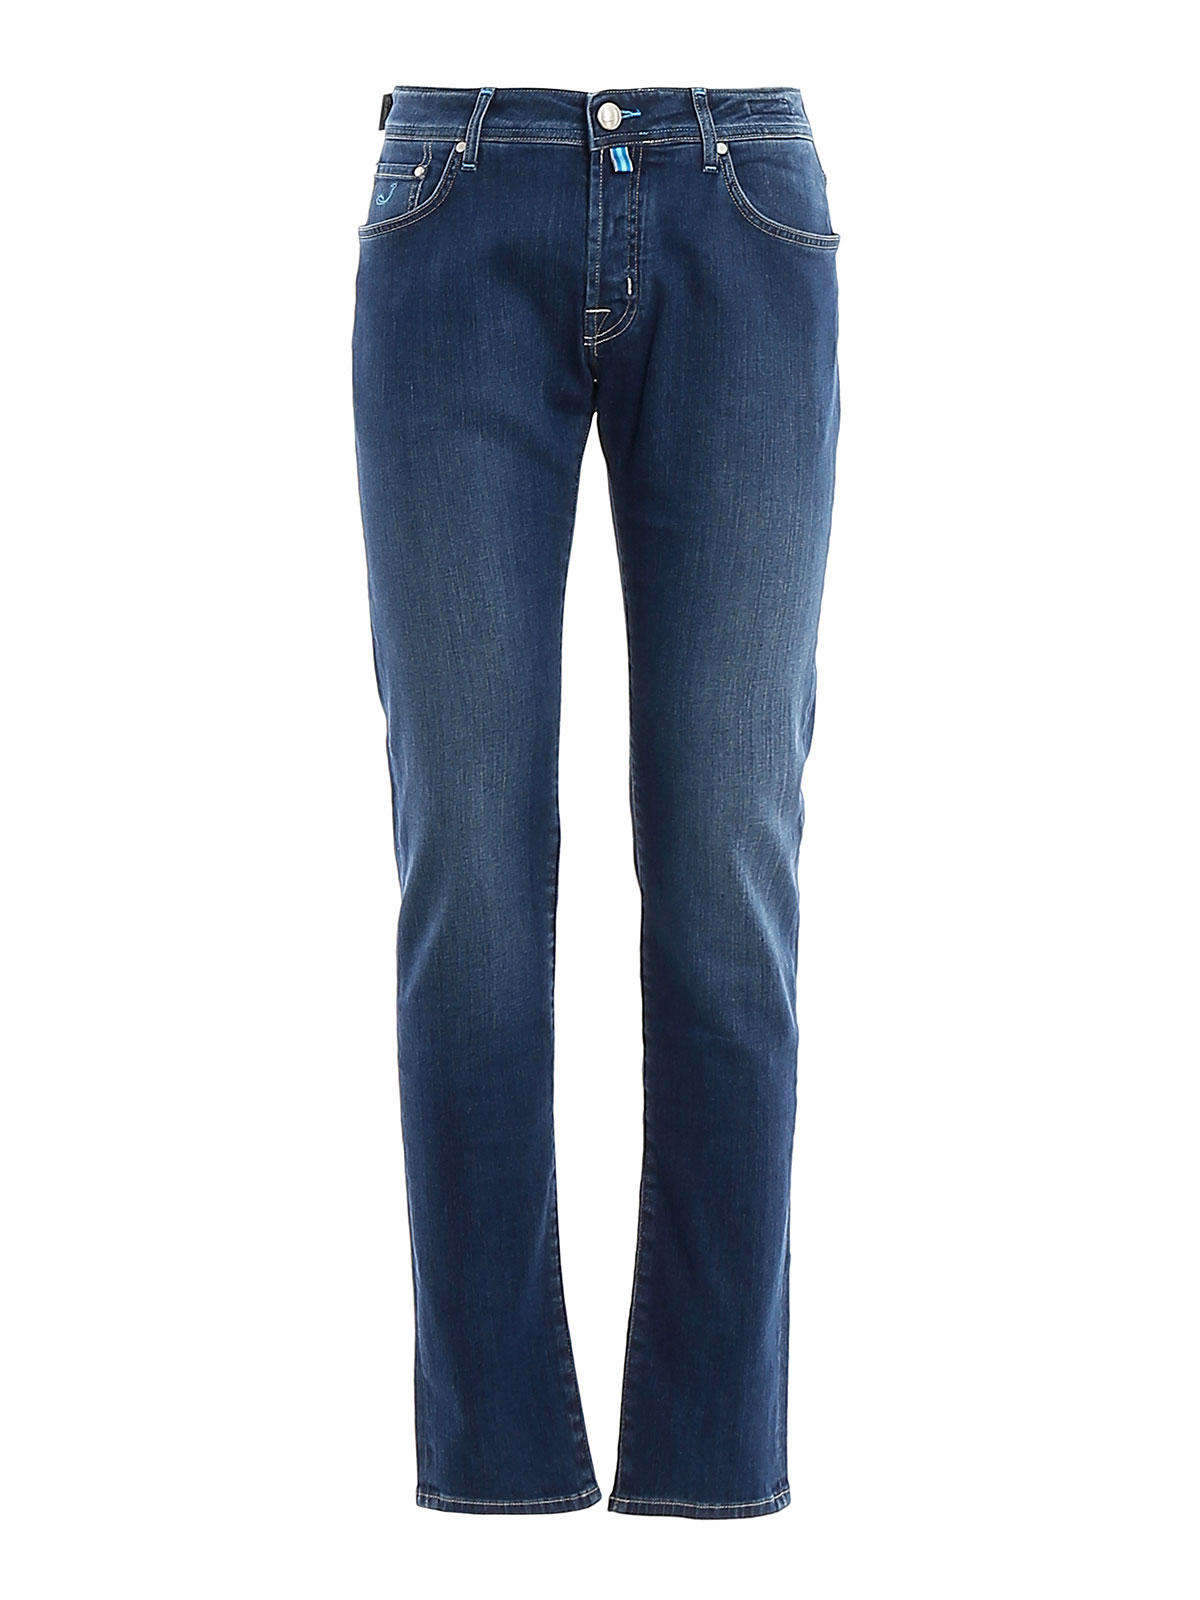 Immagine di JACOB COHEN | Jeans Uomo Style 622 Comfort Denim